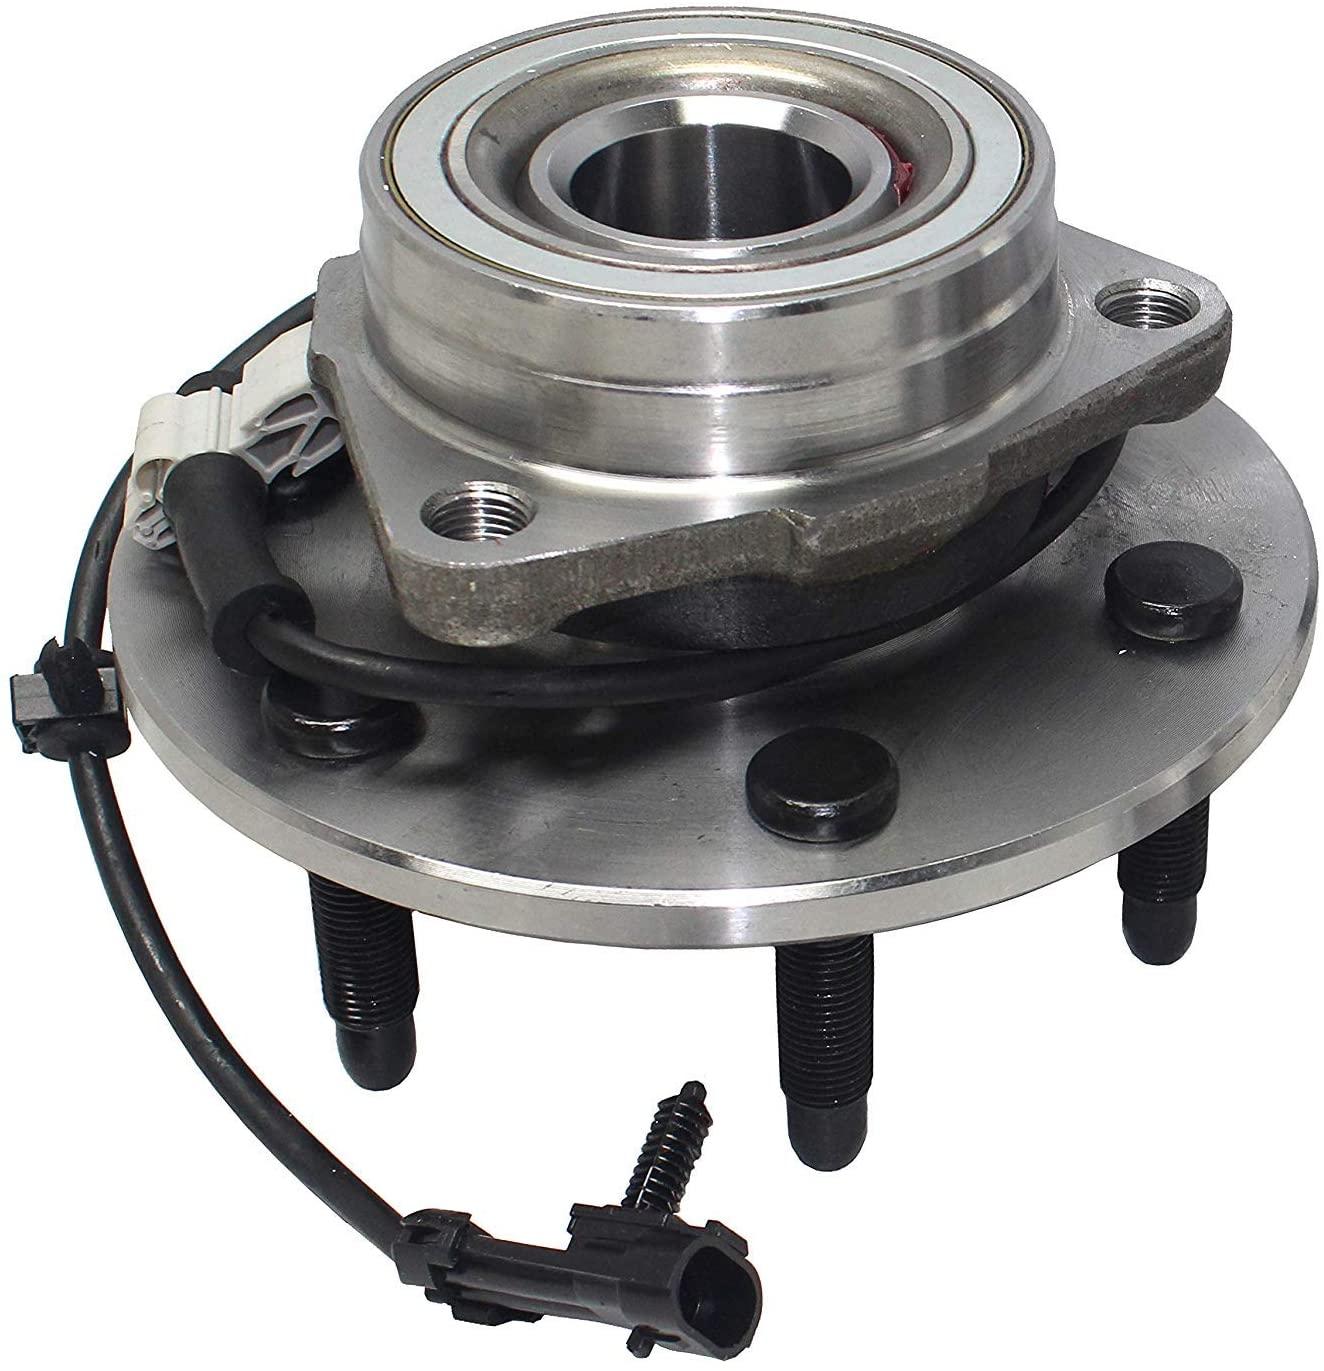 Front Wheel Bearing Hub Brake Rotor Pad Escalade Silverado 1500 Tahoe Yukon 4WD